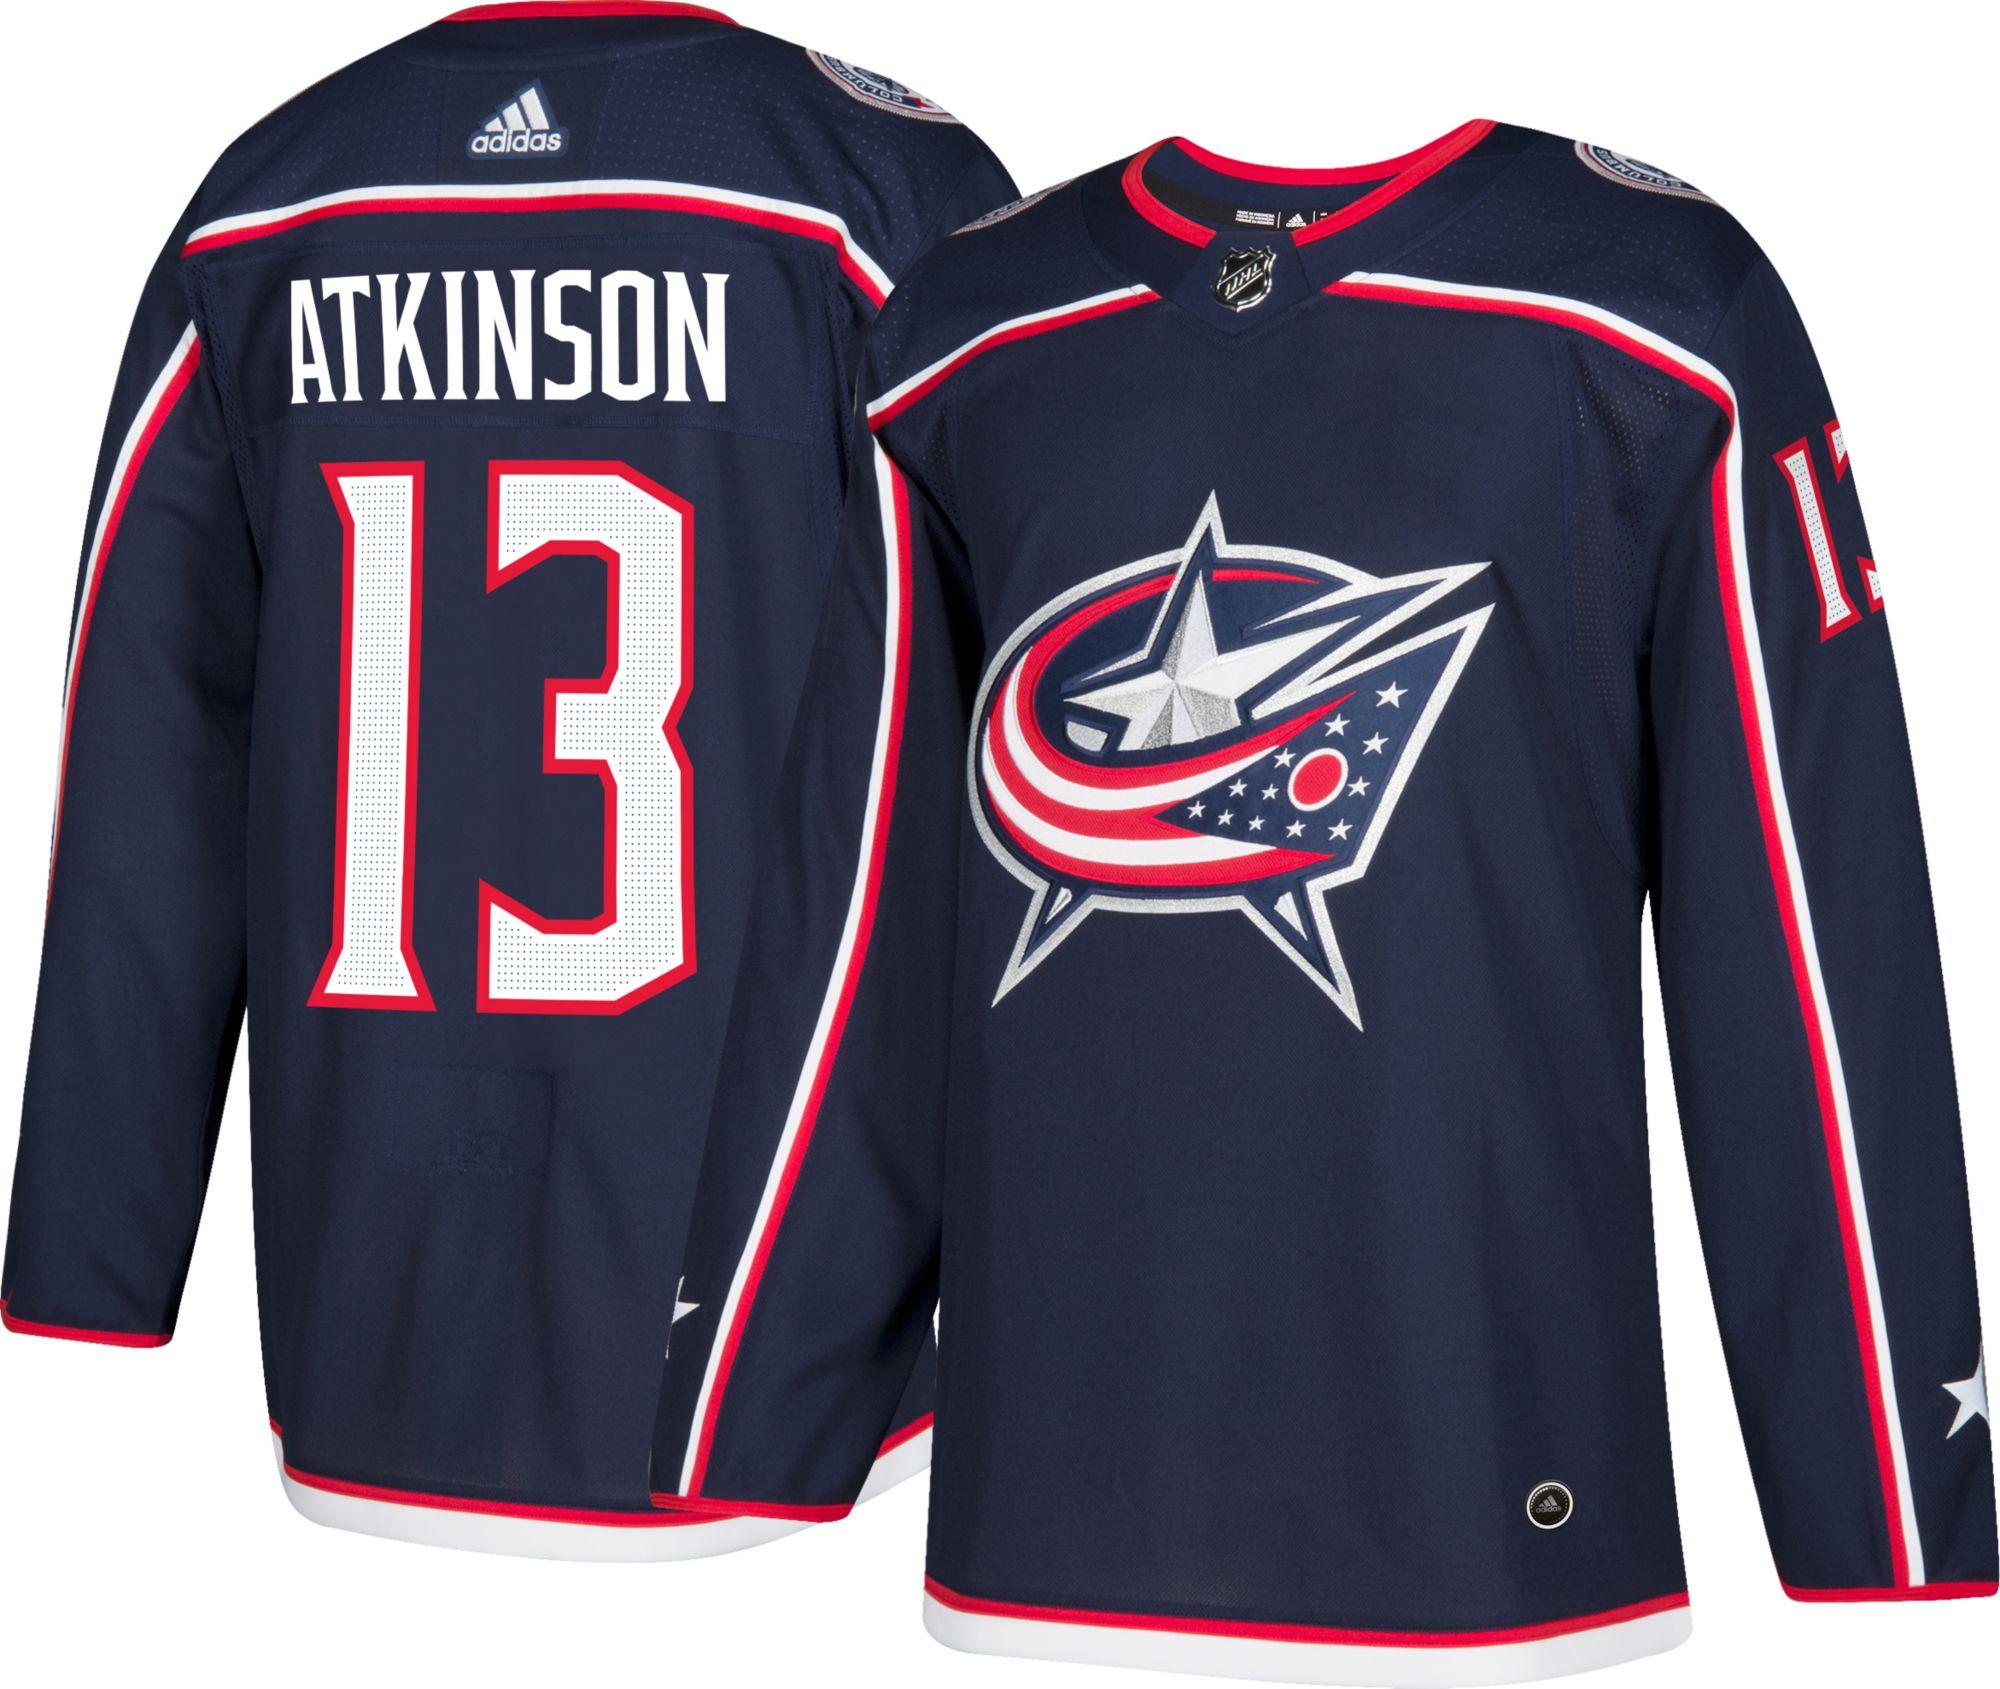 Adidas hombre 's Columbus AZUL Jackets Cam Atkinson 13 Authentic pro